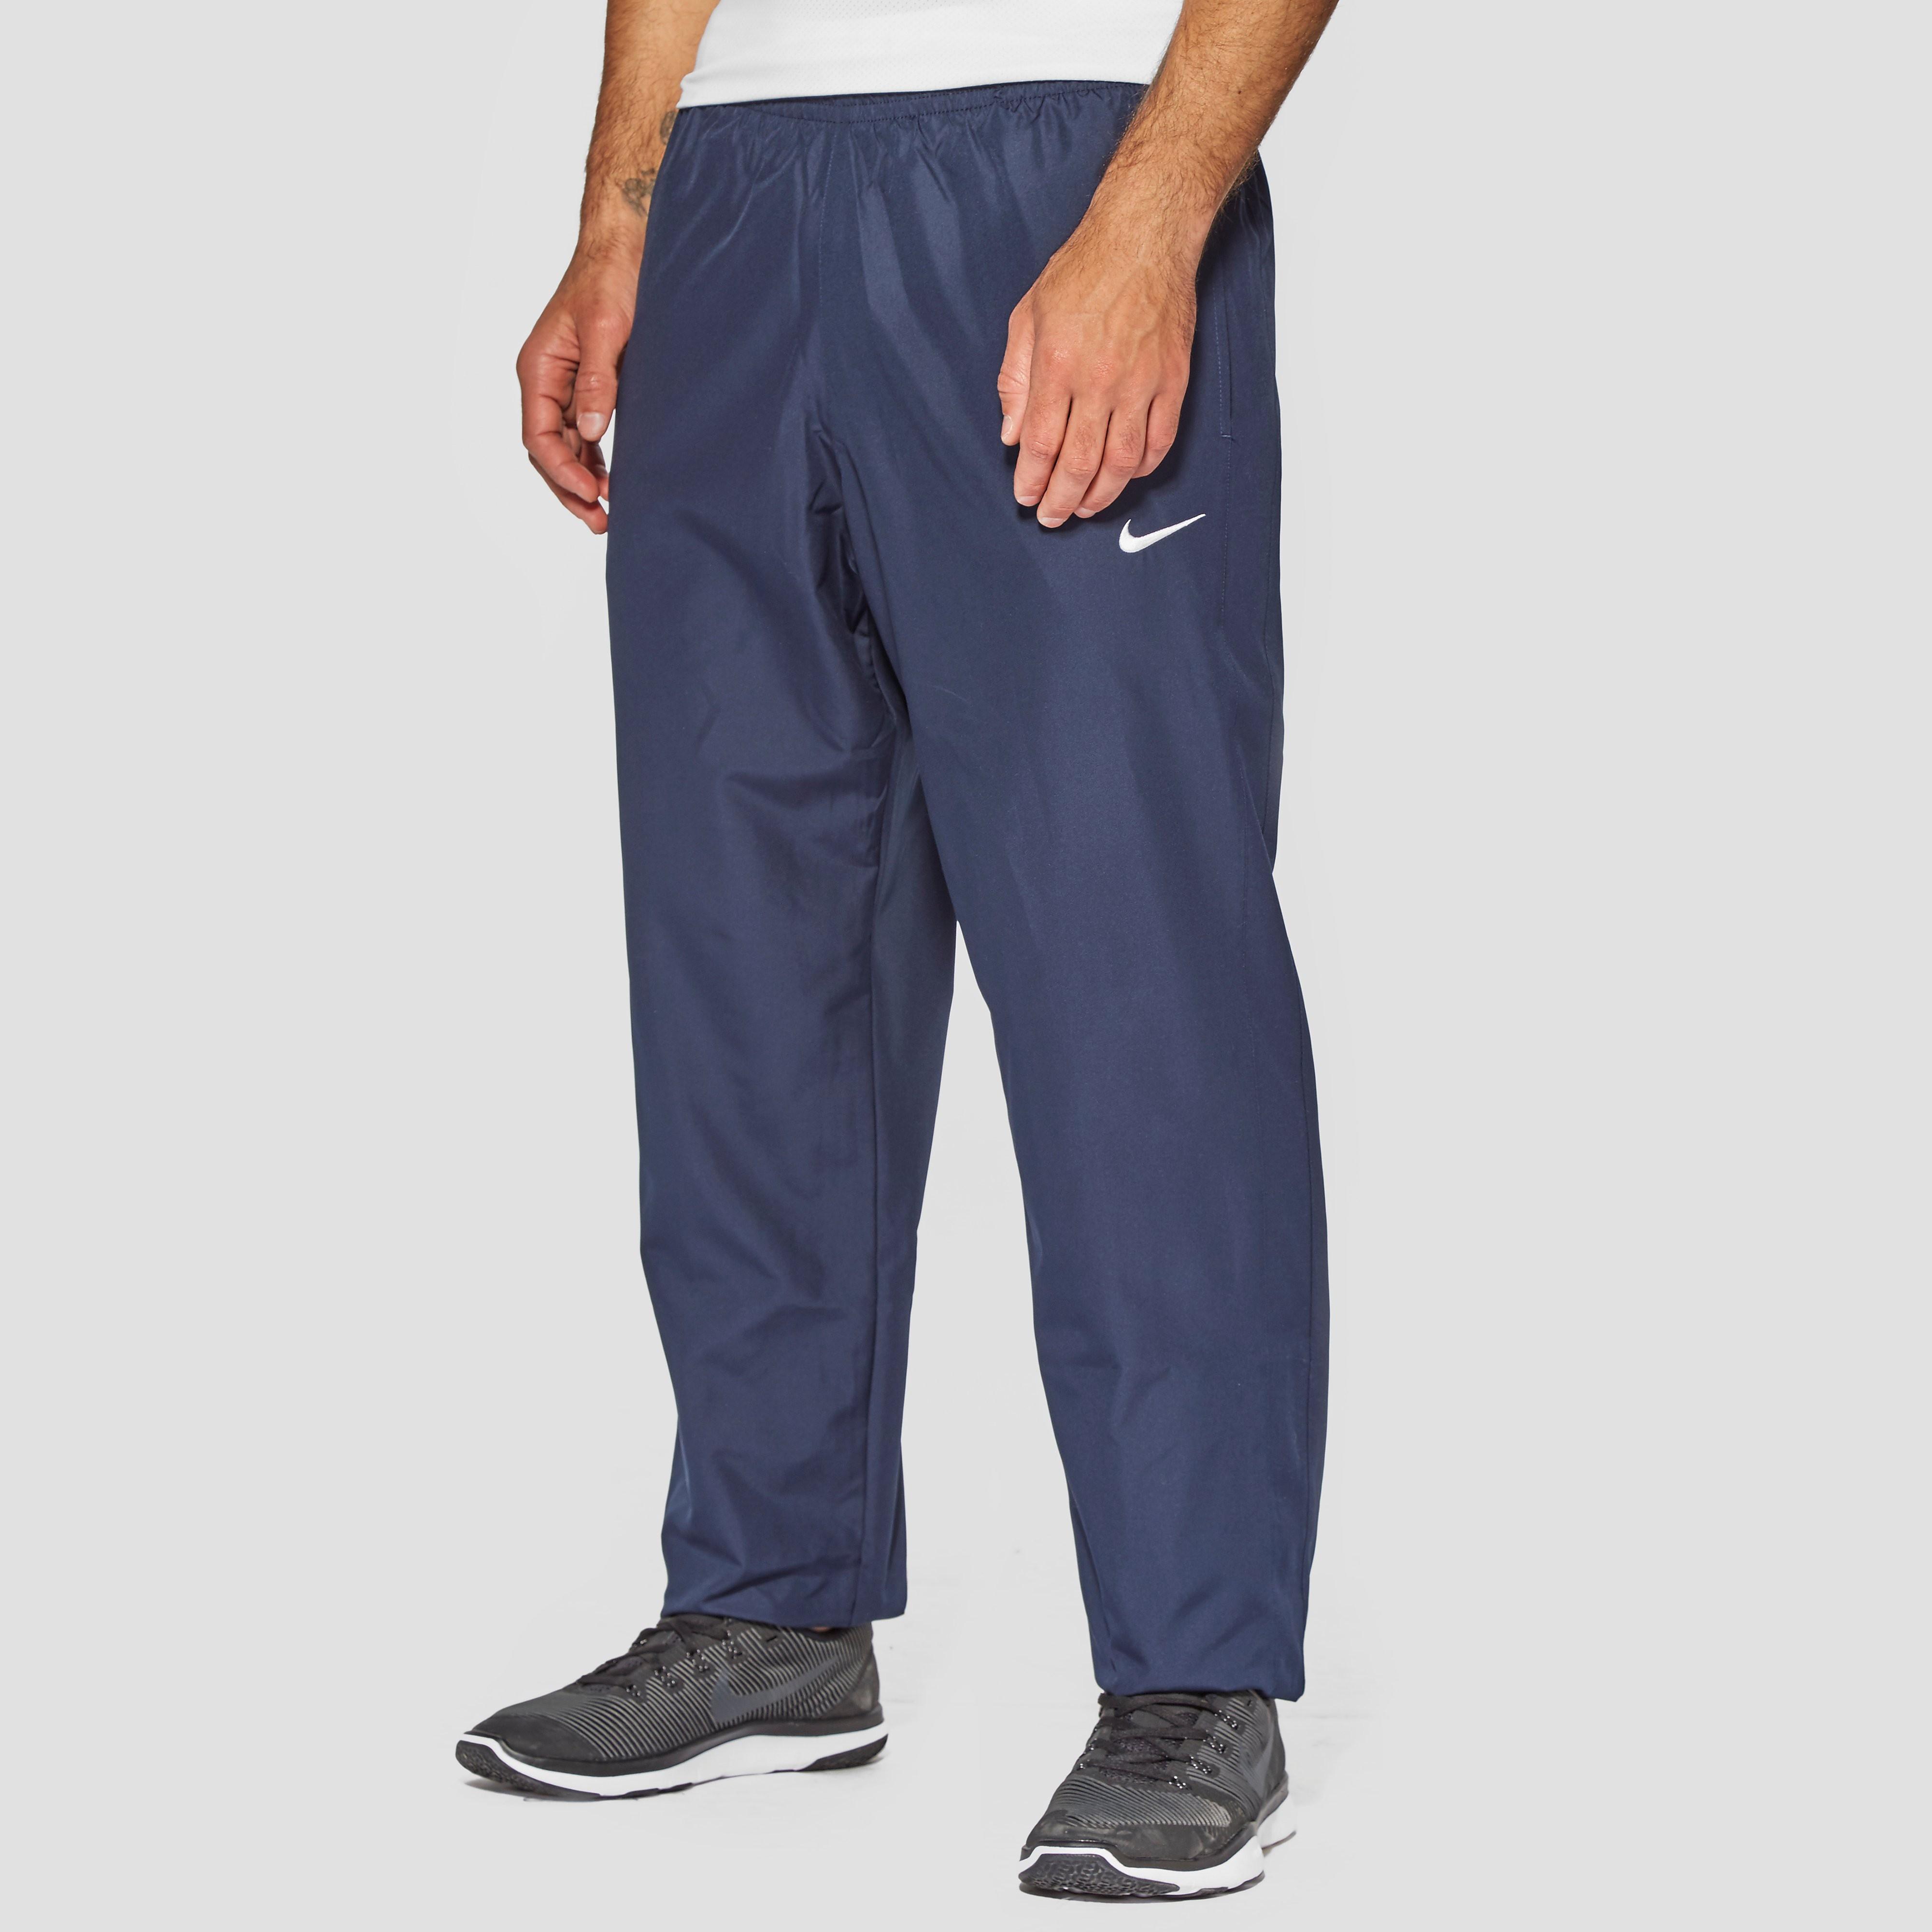 Nike Rocket Men's Pants